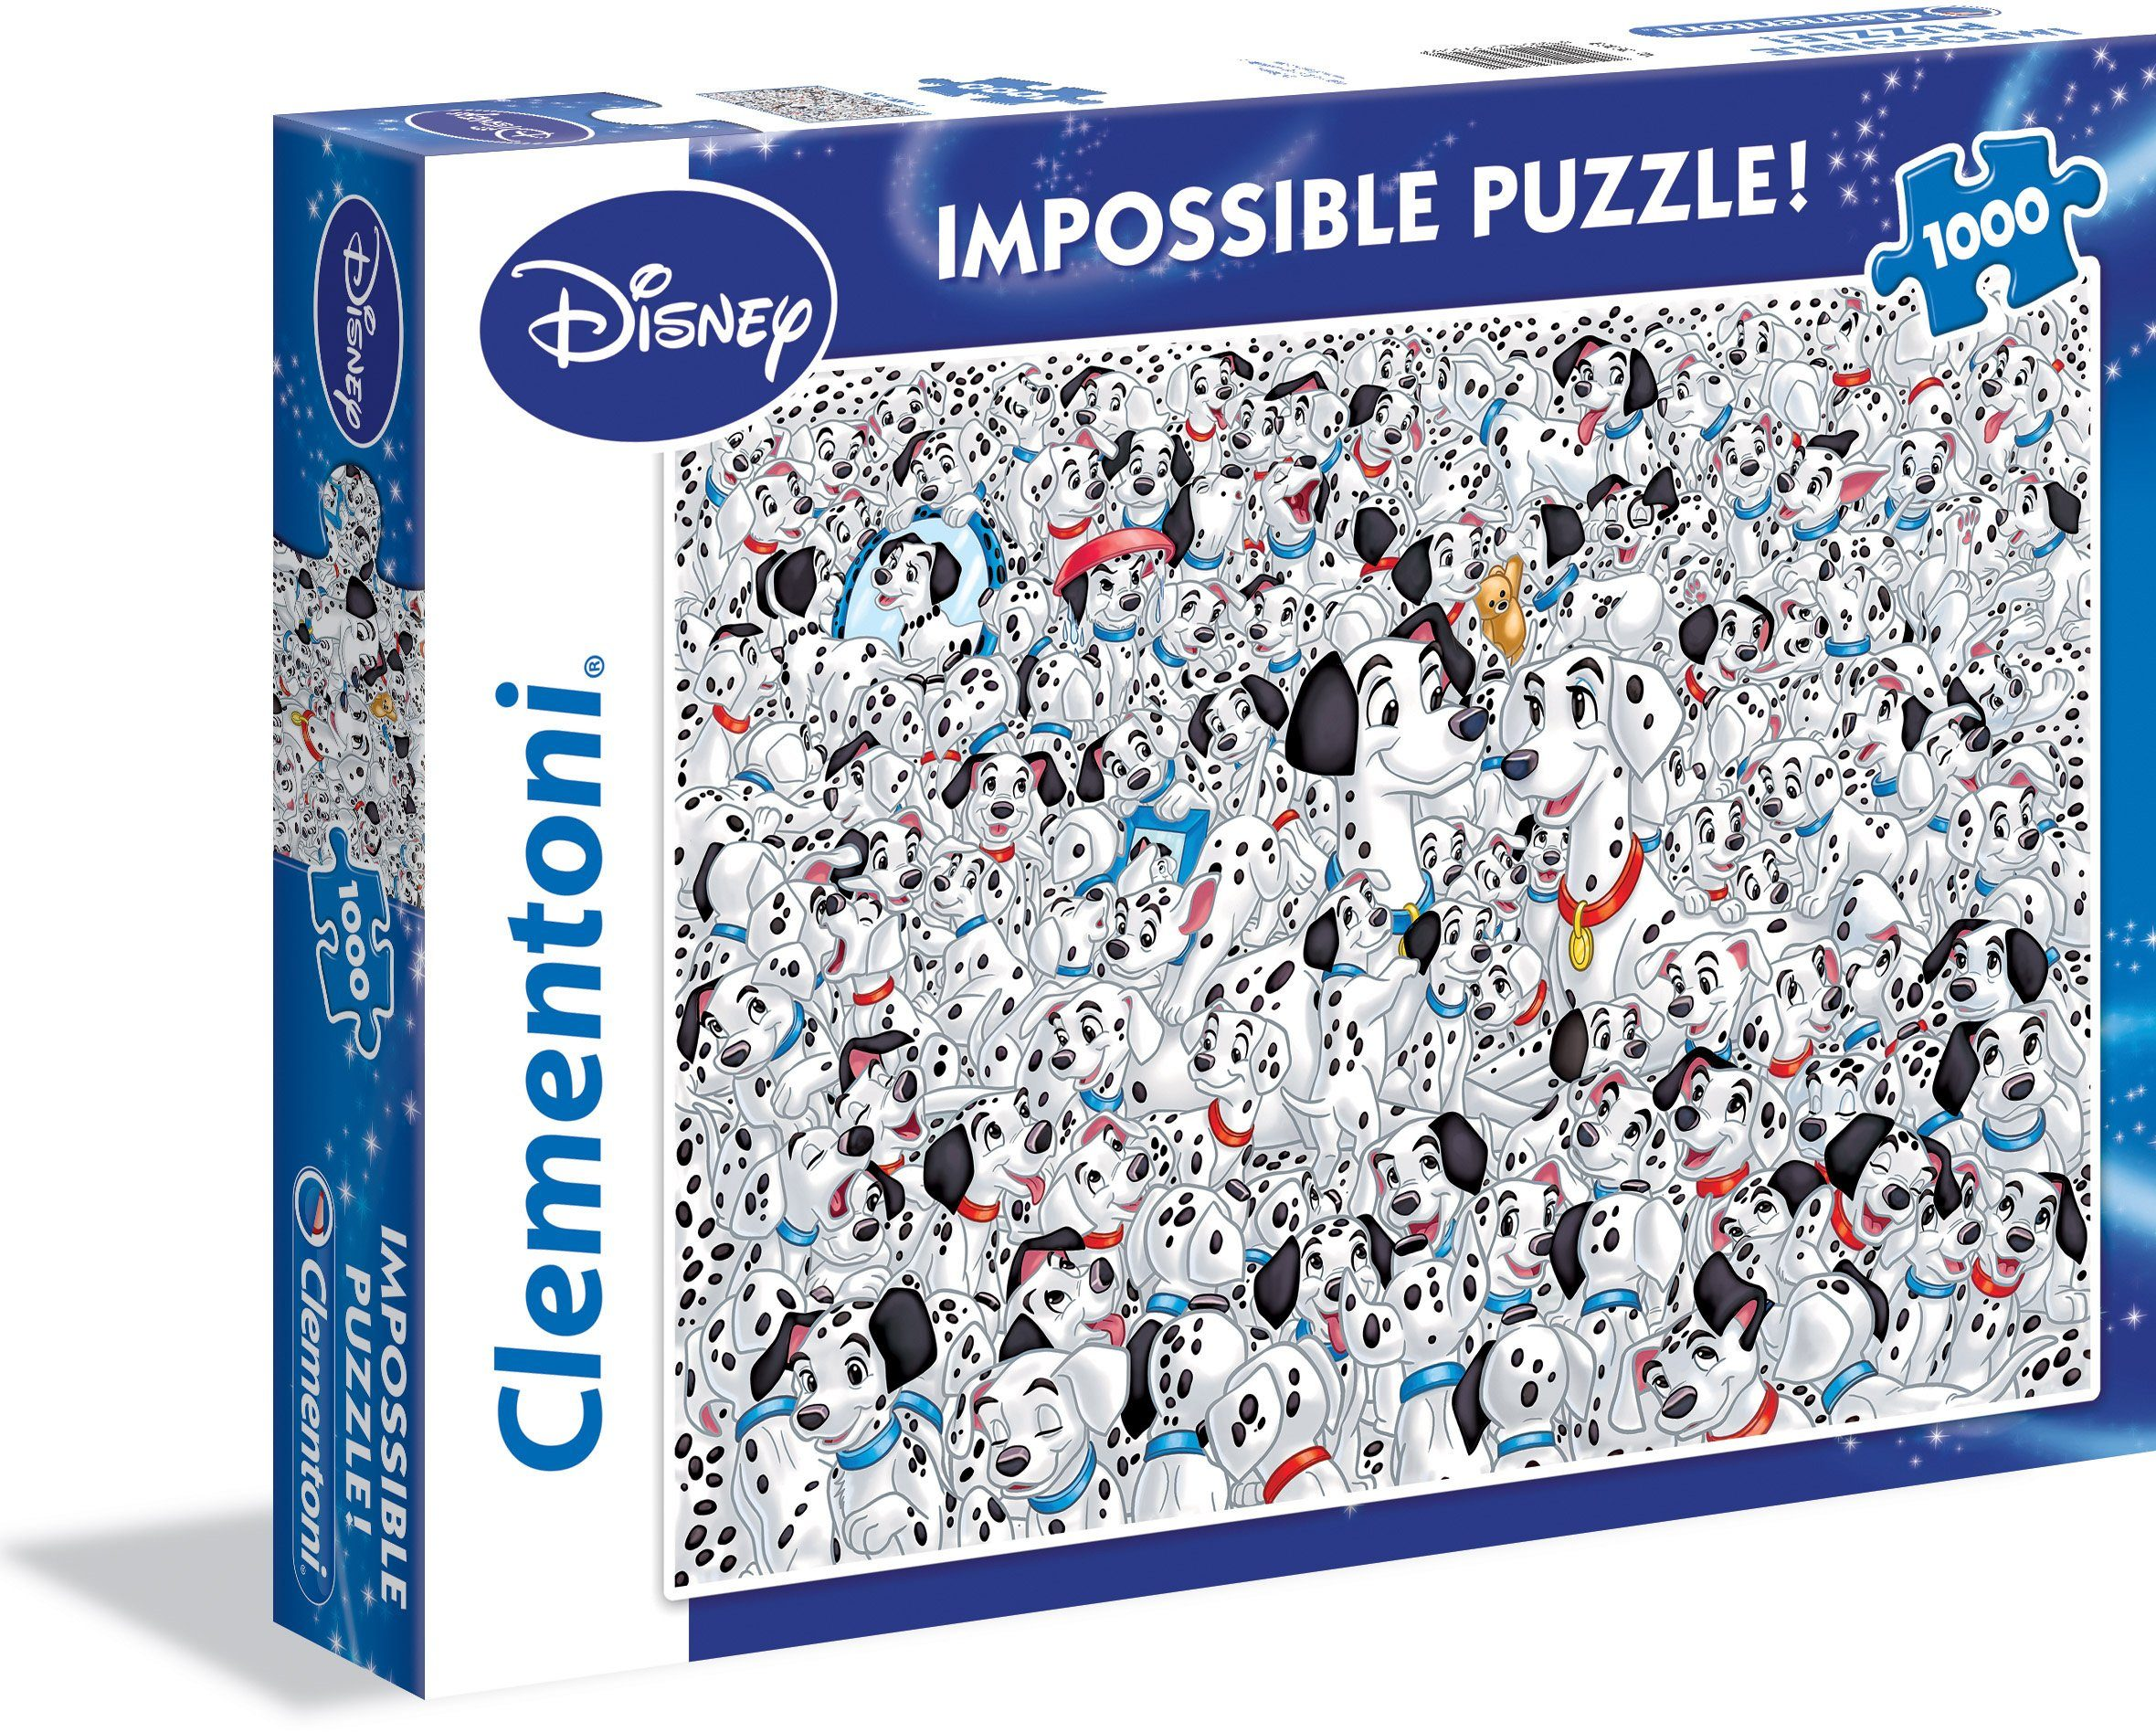 Clementoni Puzzle, 1000 Teile, »Disney 101 Dalmatiner Impossible«